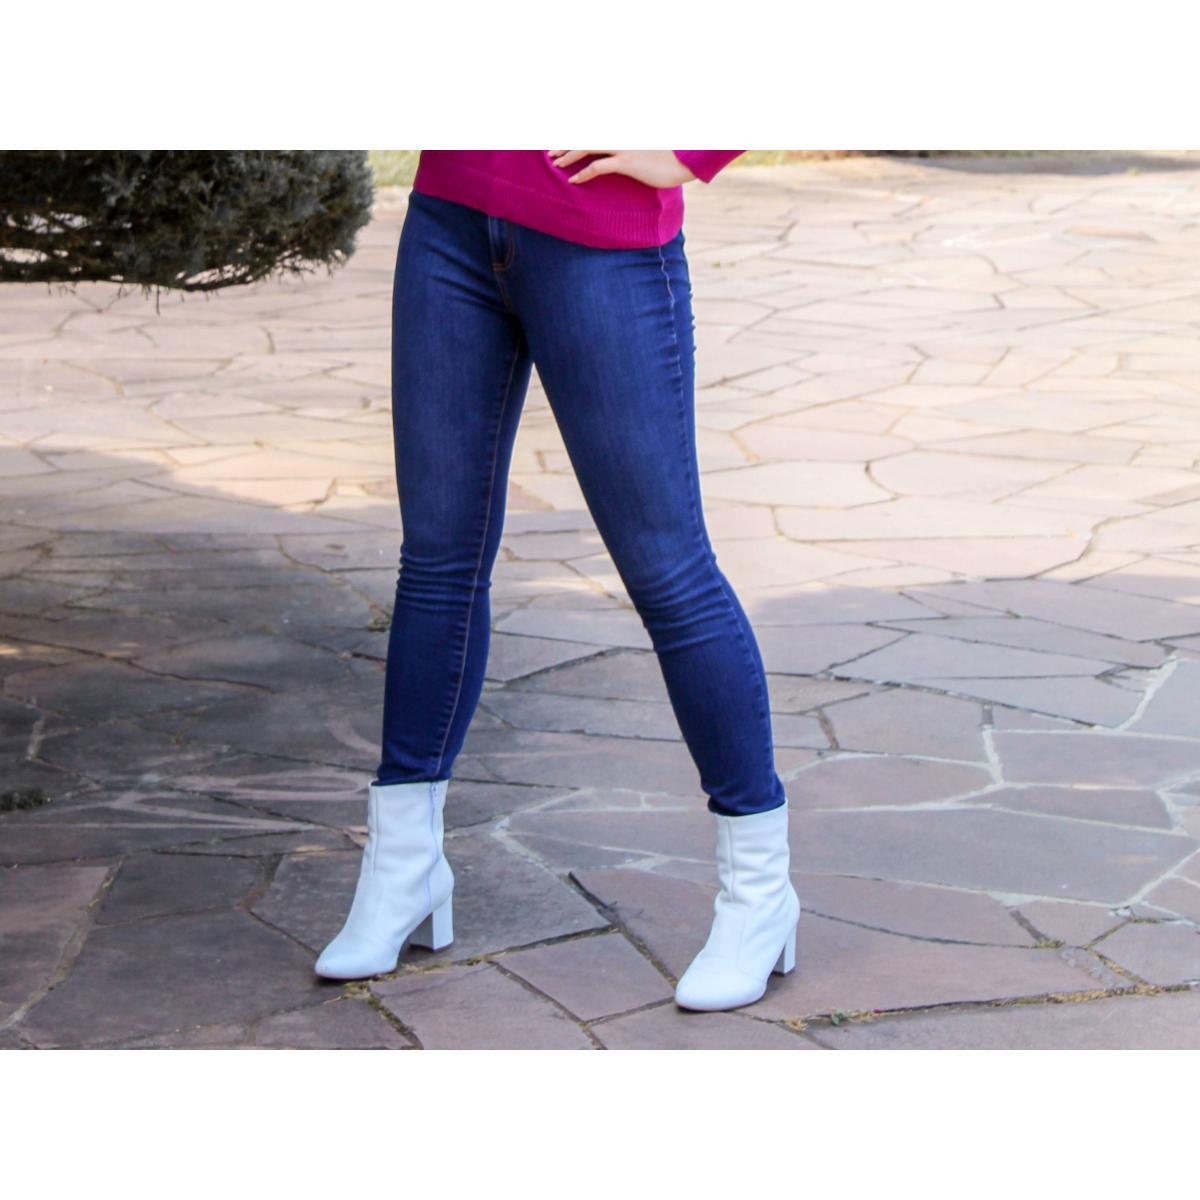 Calça Feminina Index 01.01.004993 Jeans